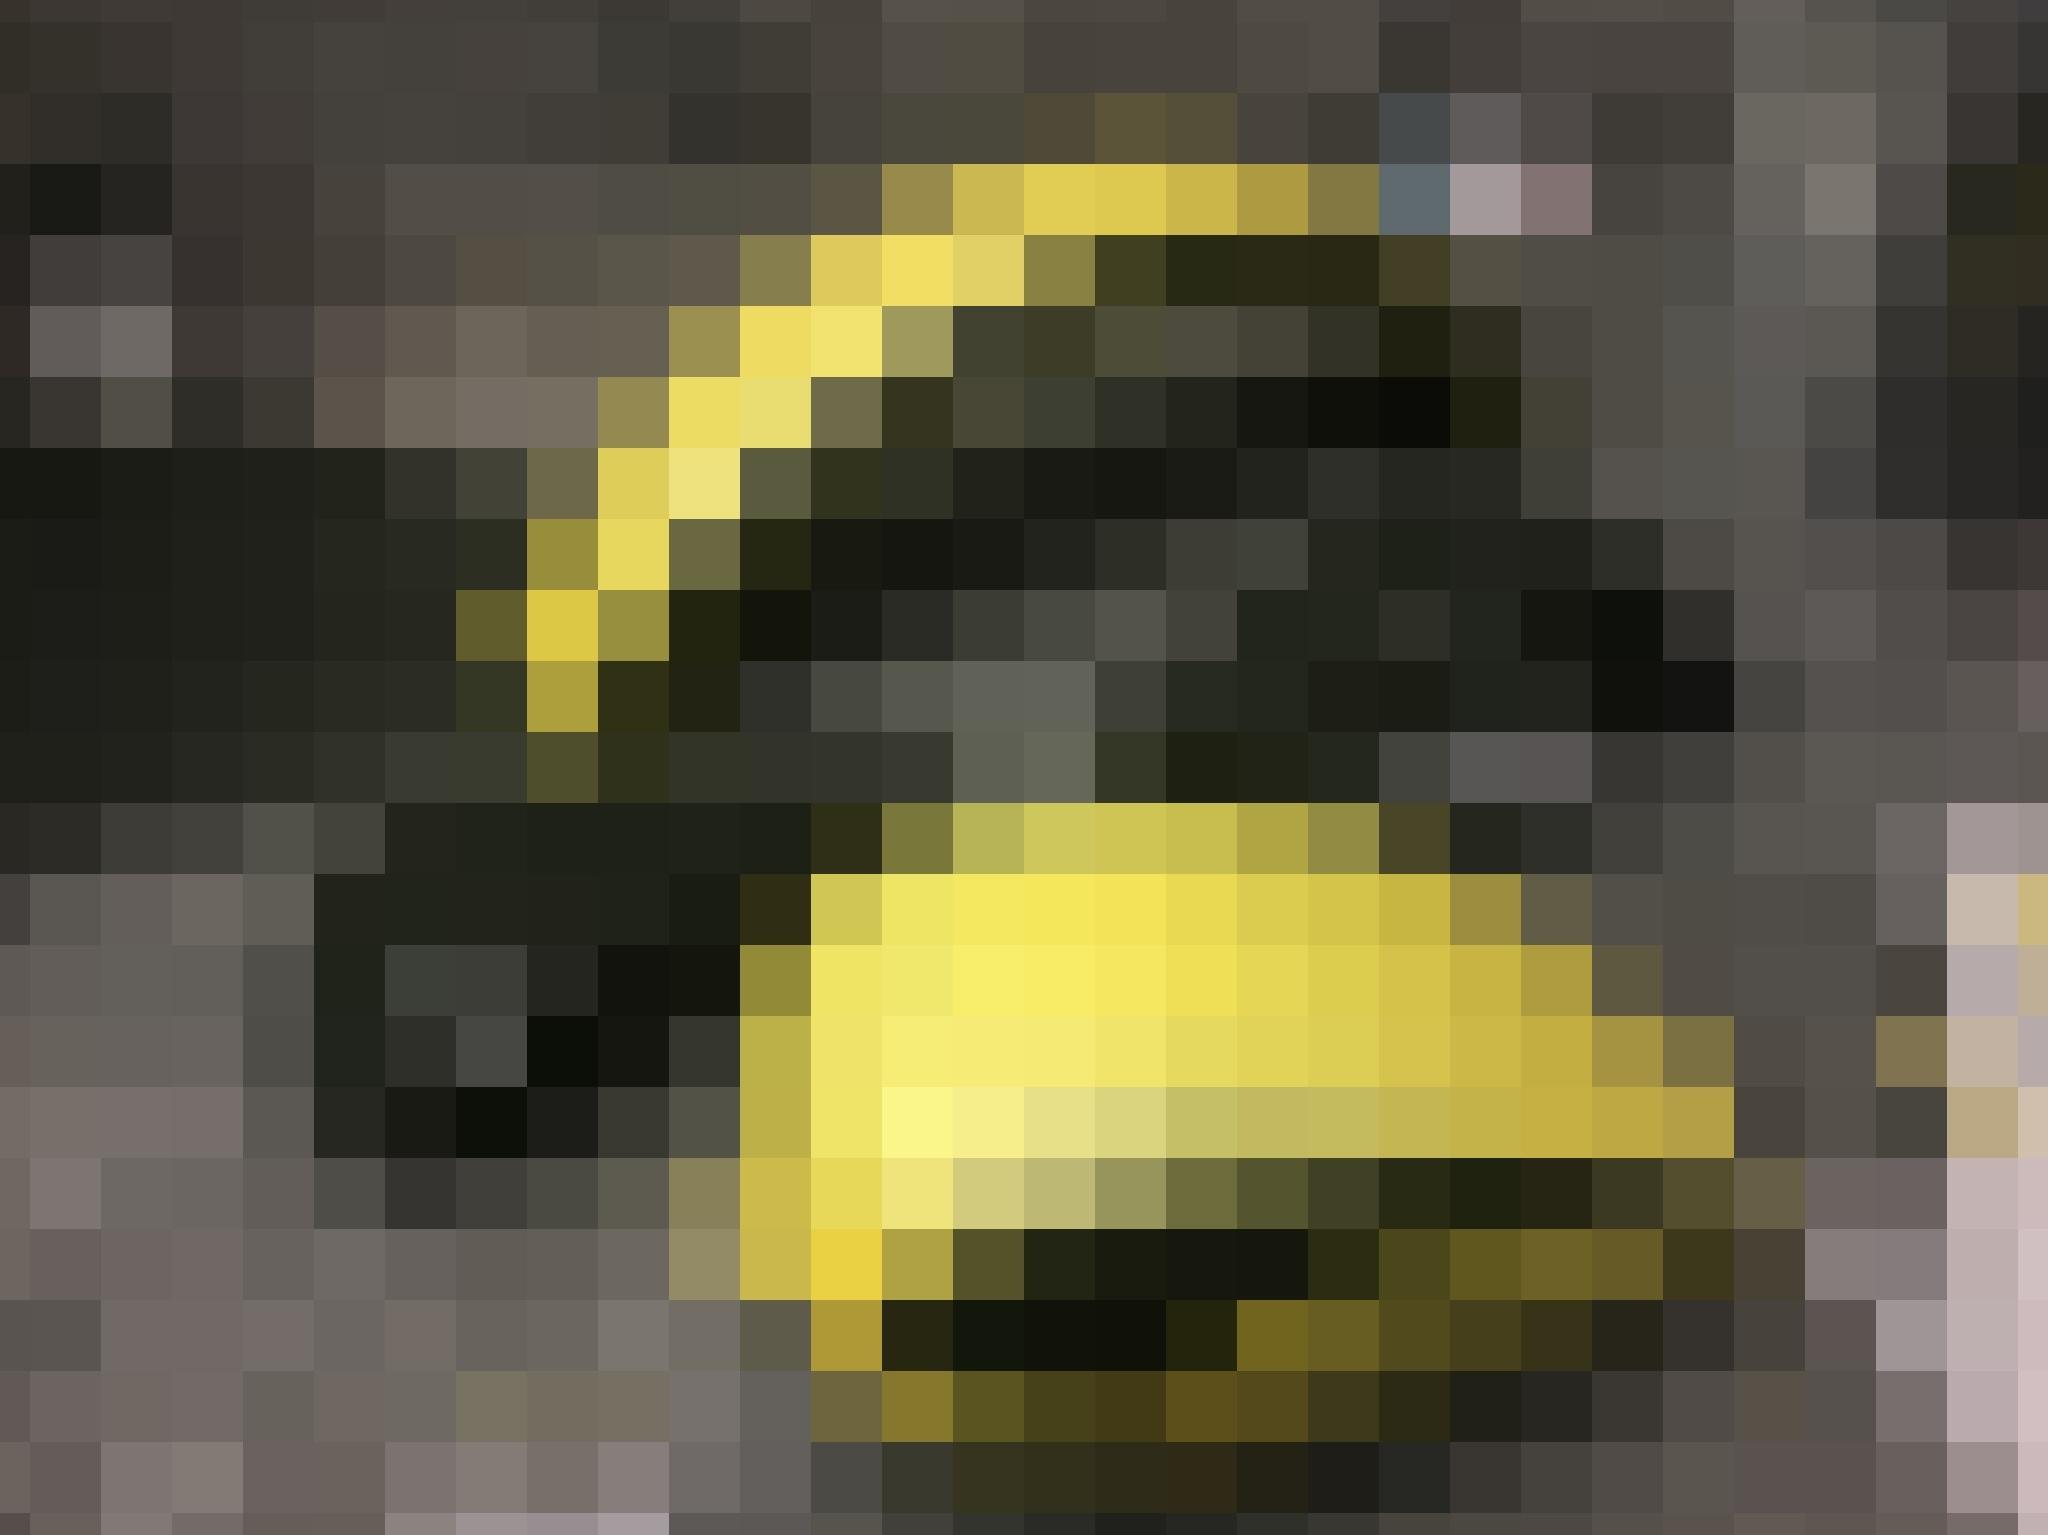 a0164918_19035491.jpg